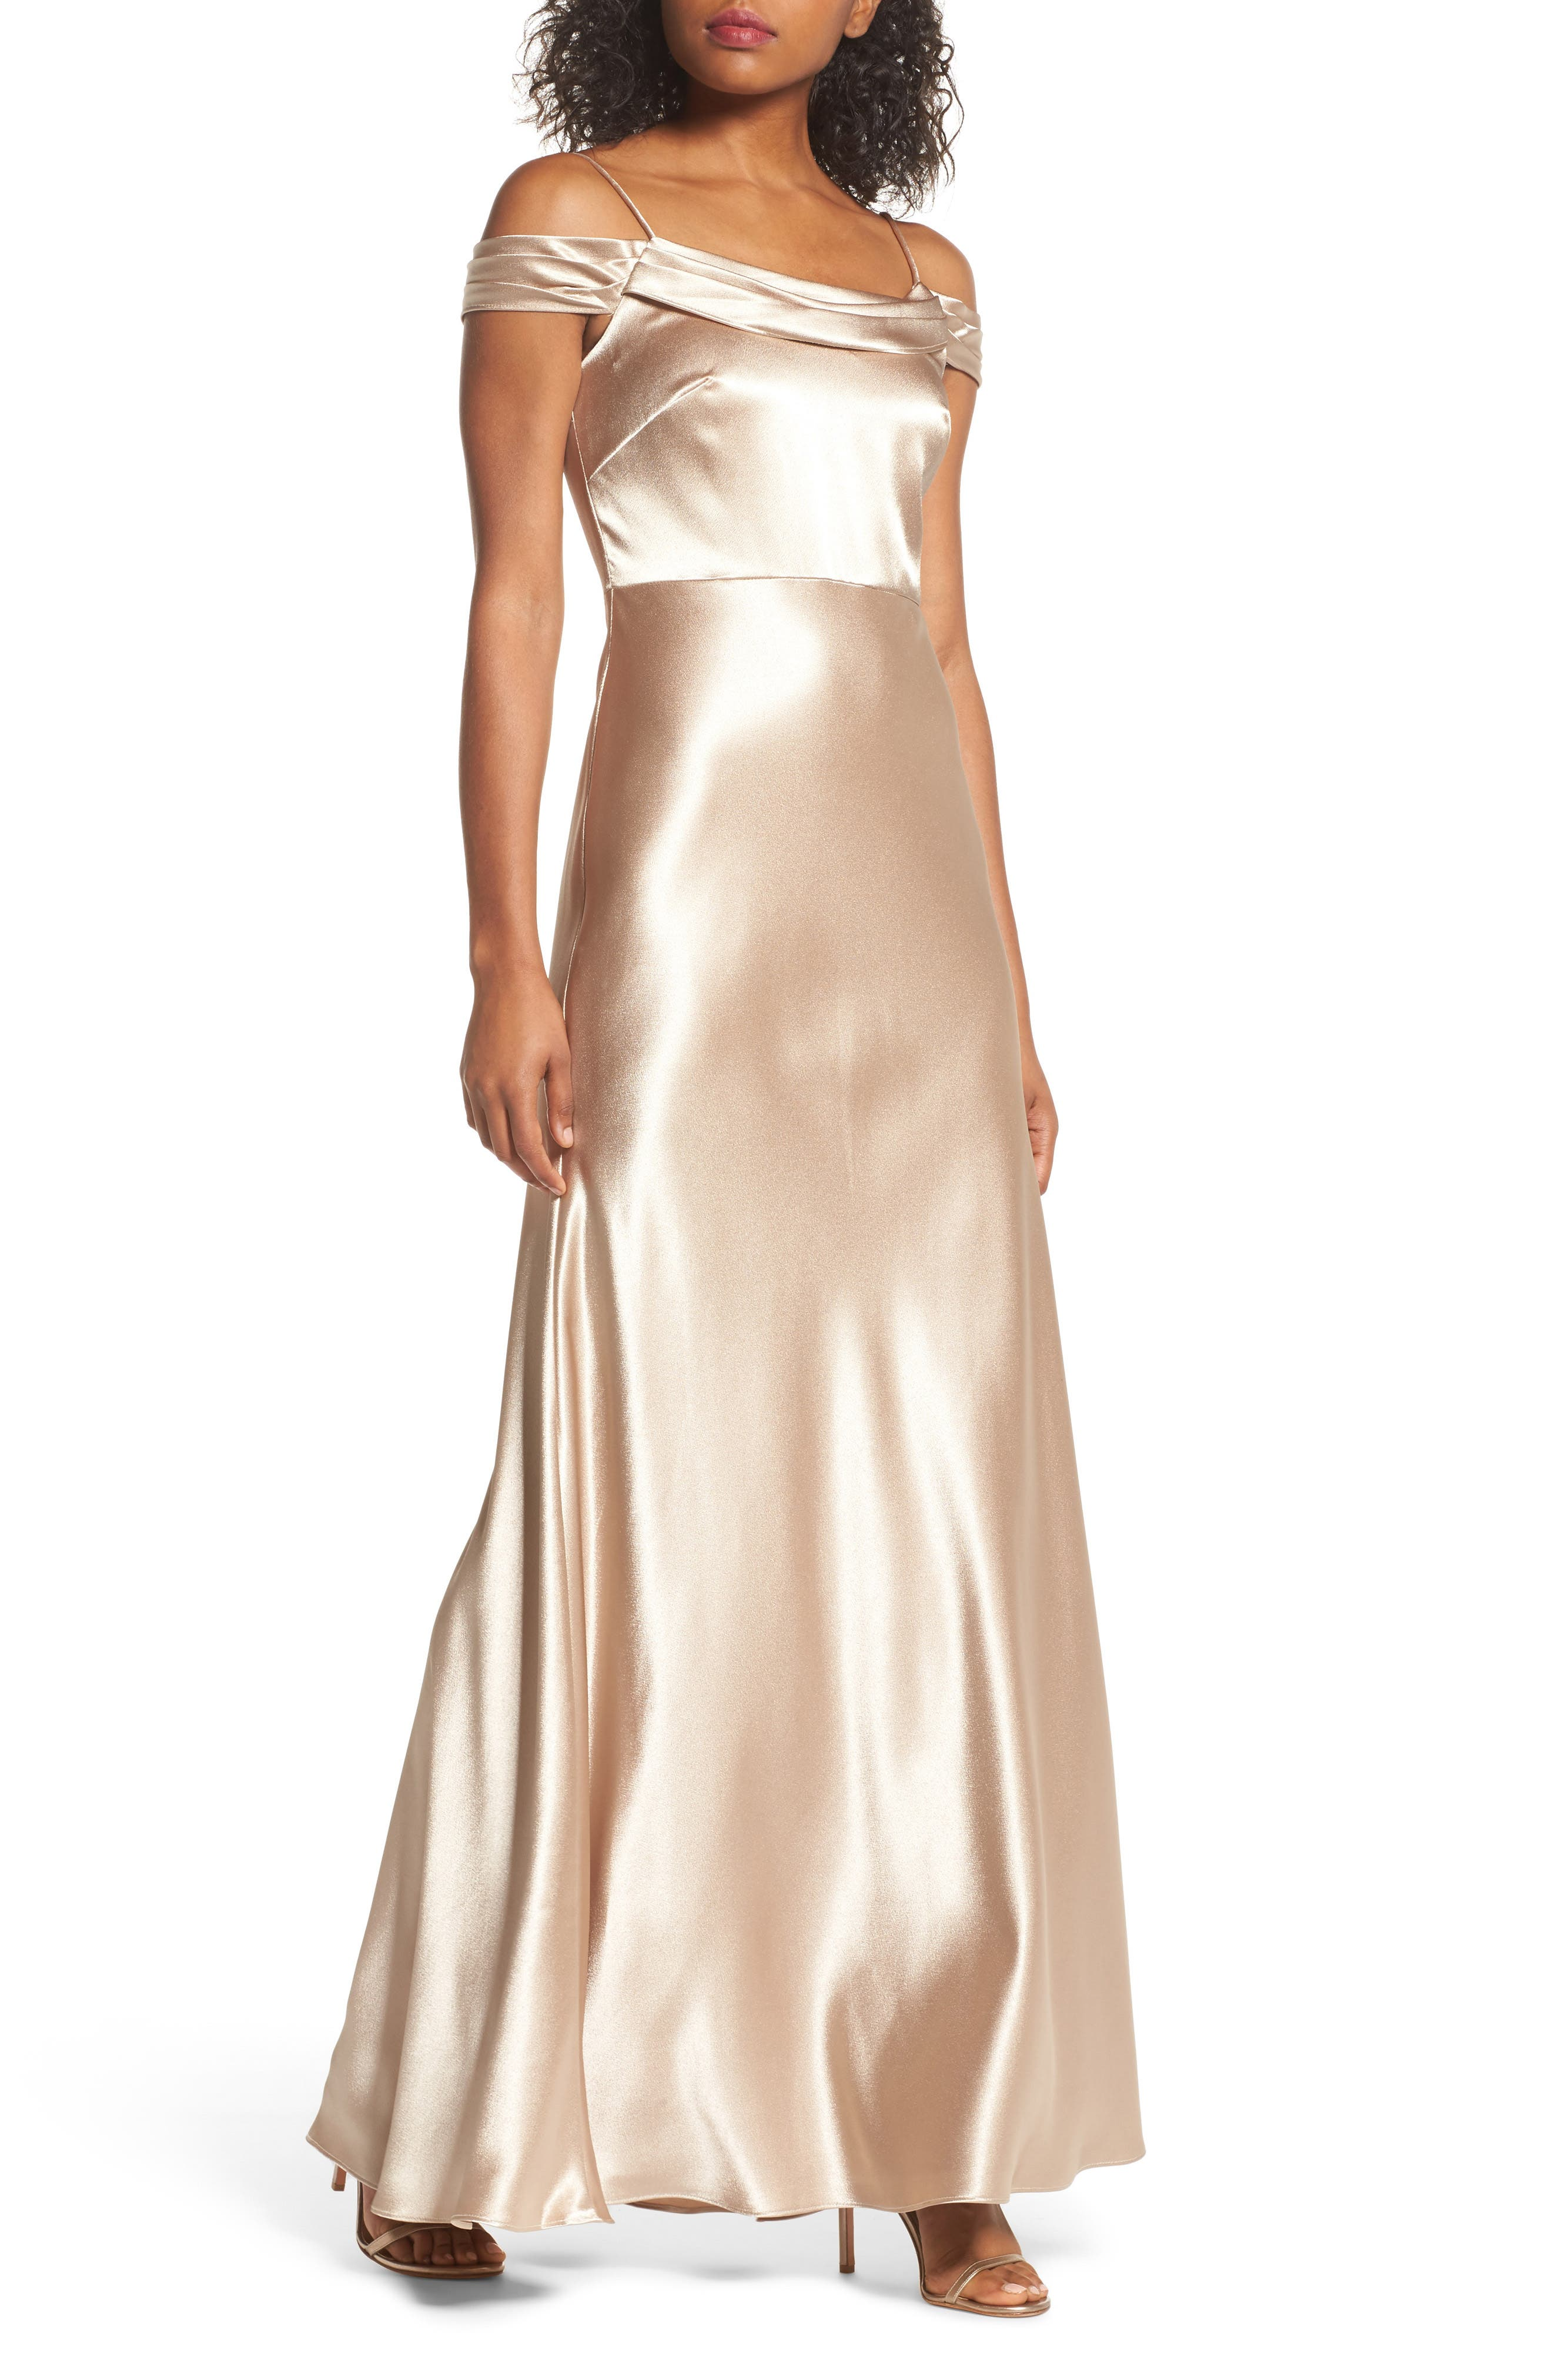 Alternate Image 1 Selected - Jenny Yoo Serene Satin Off the Shoulder Gown